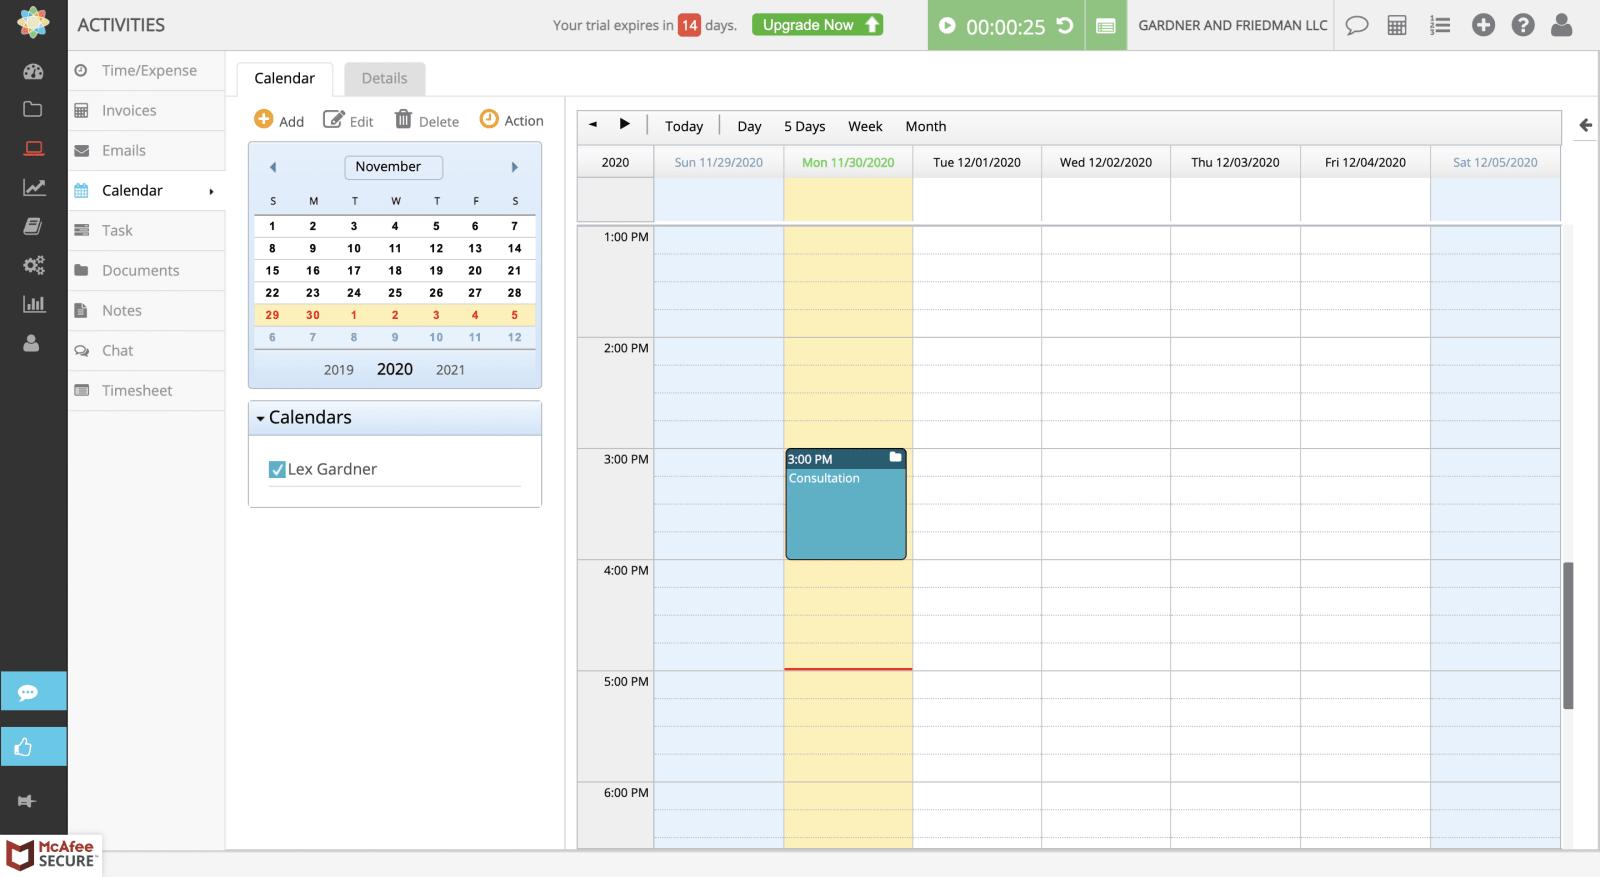 cosmolex calendar image